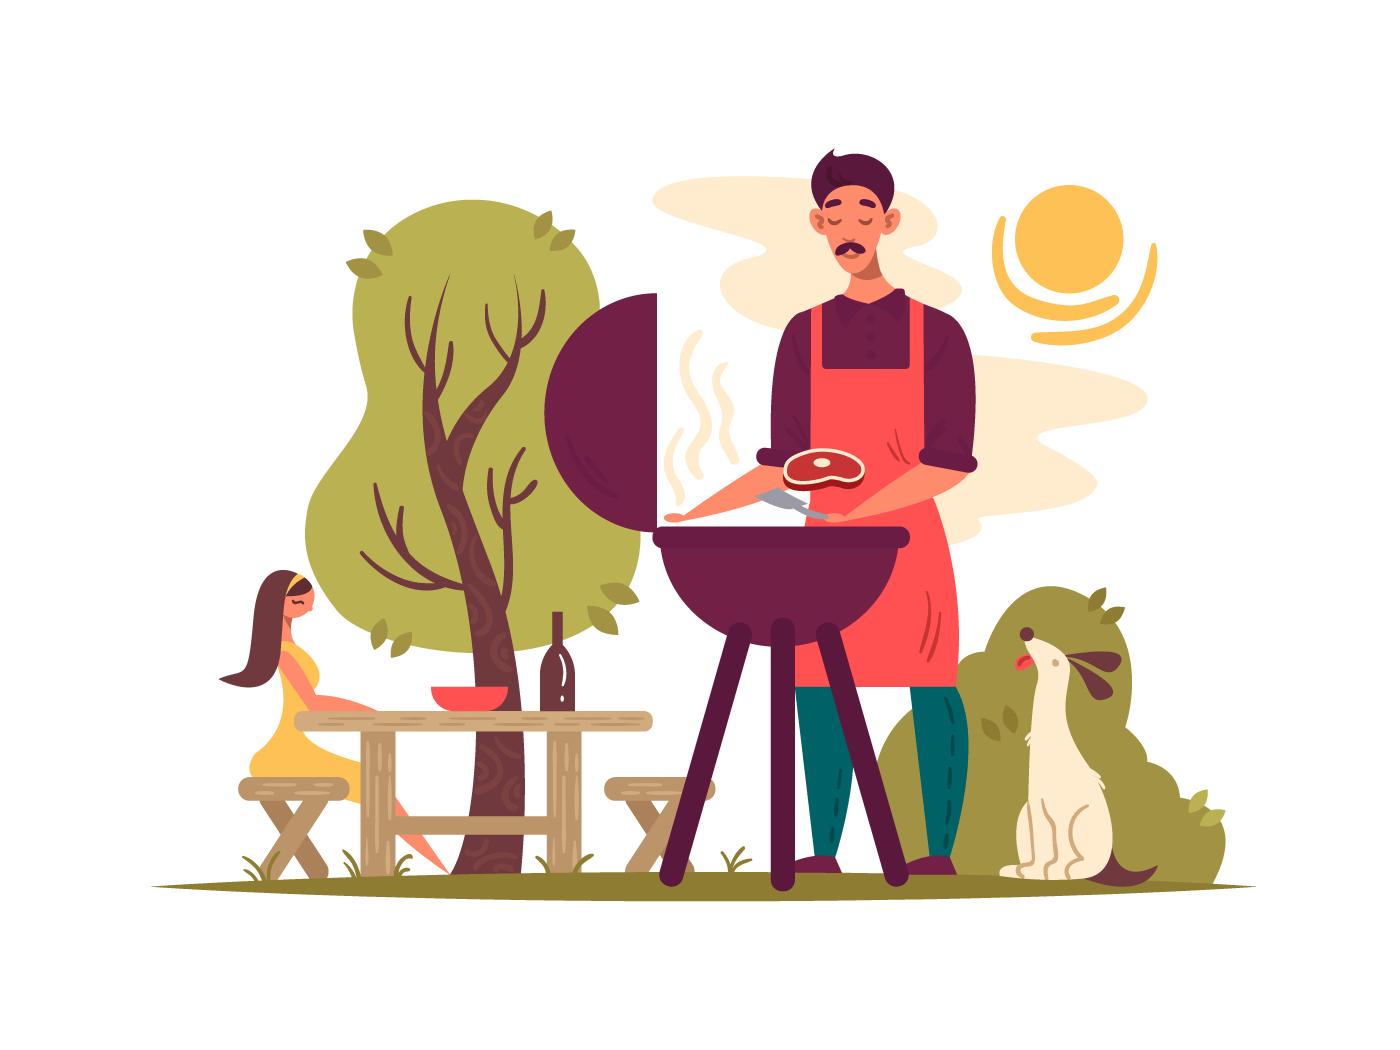 Man preparing barbecue on grill illustration